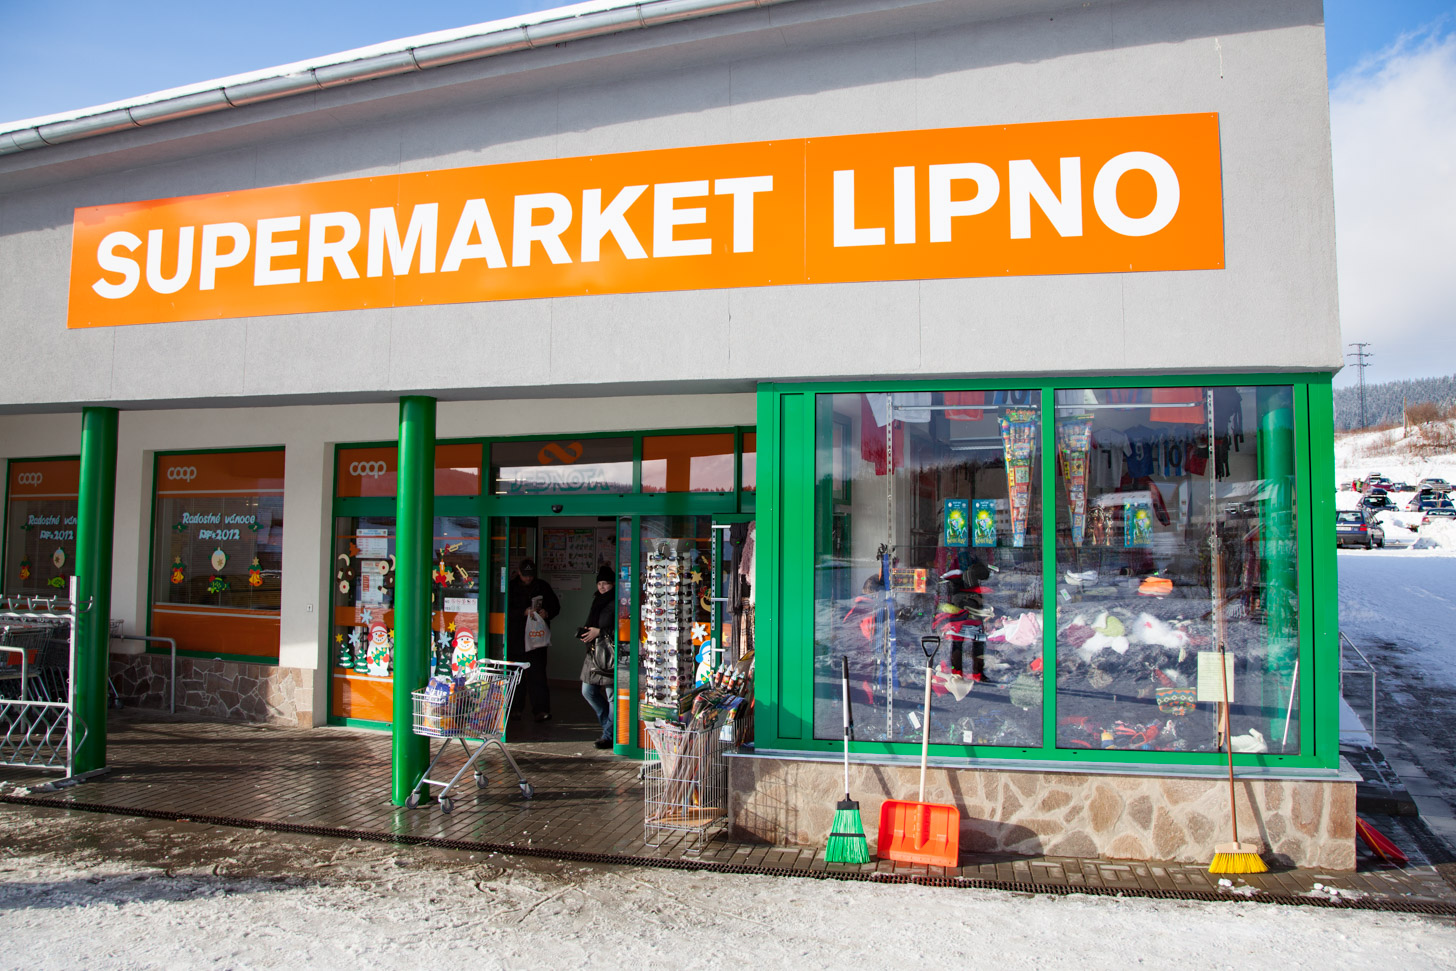 De Coop supermarkt in Lipno nad Vltavou